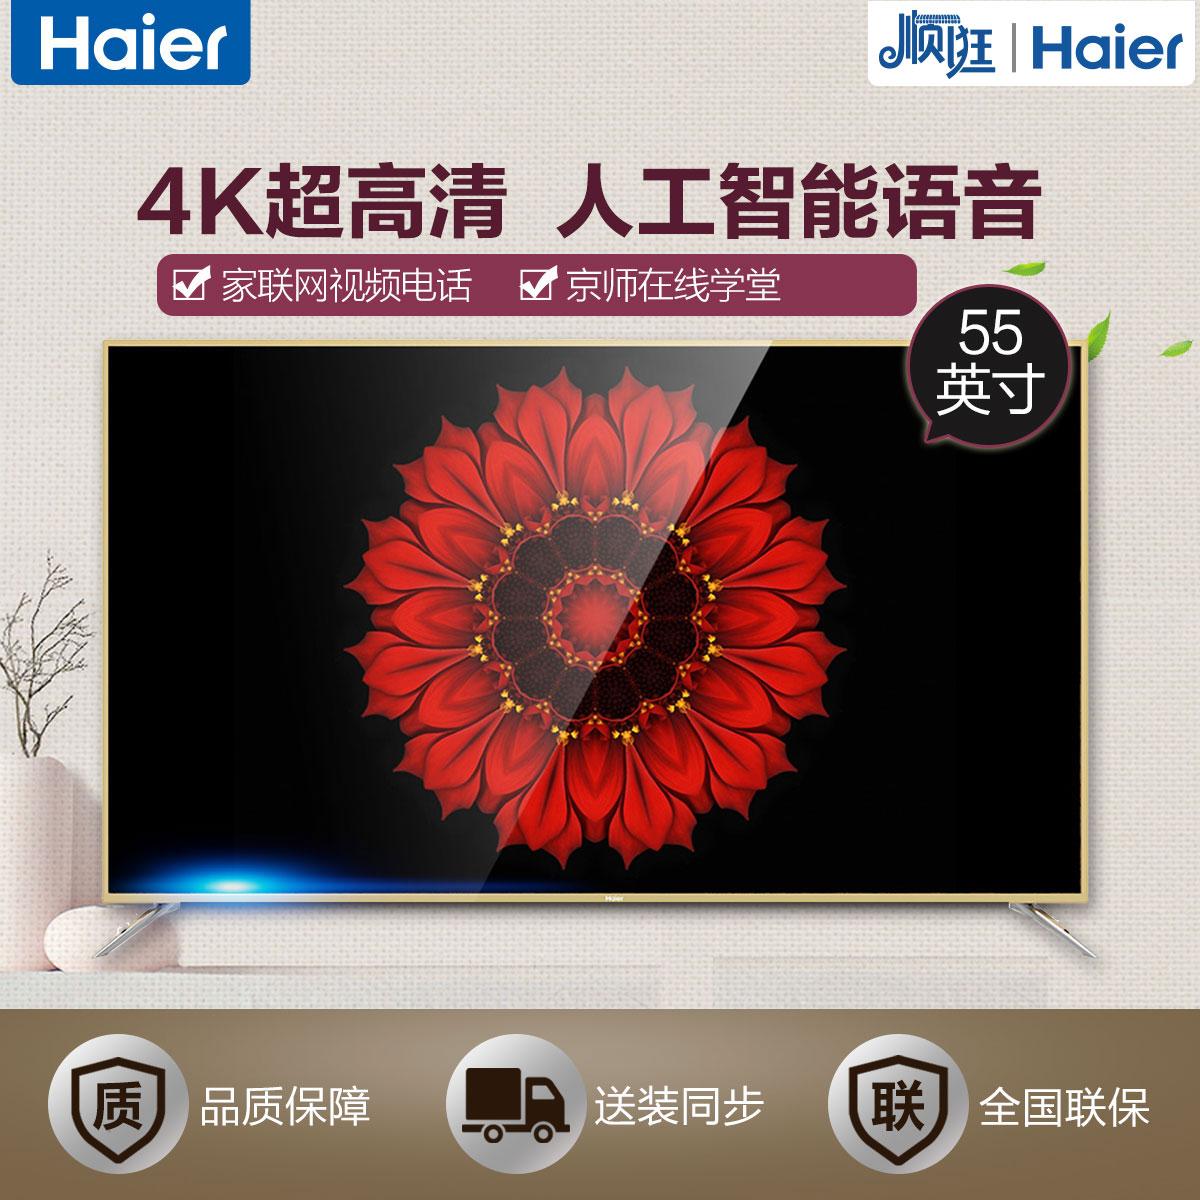 Haier/海尔             4K电视             LS55AL88K52